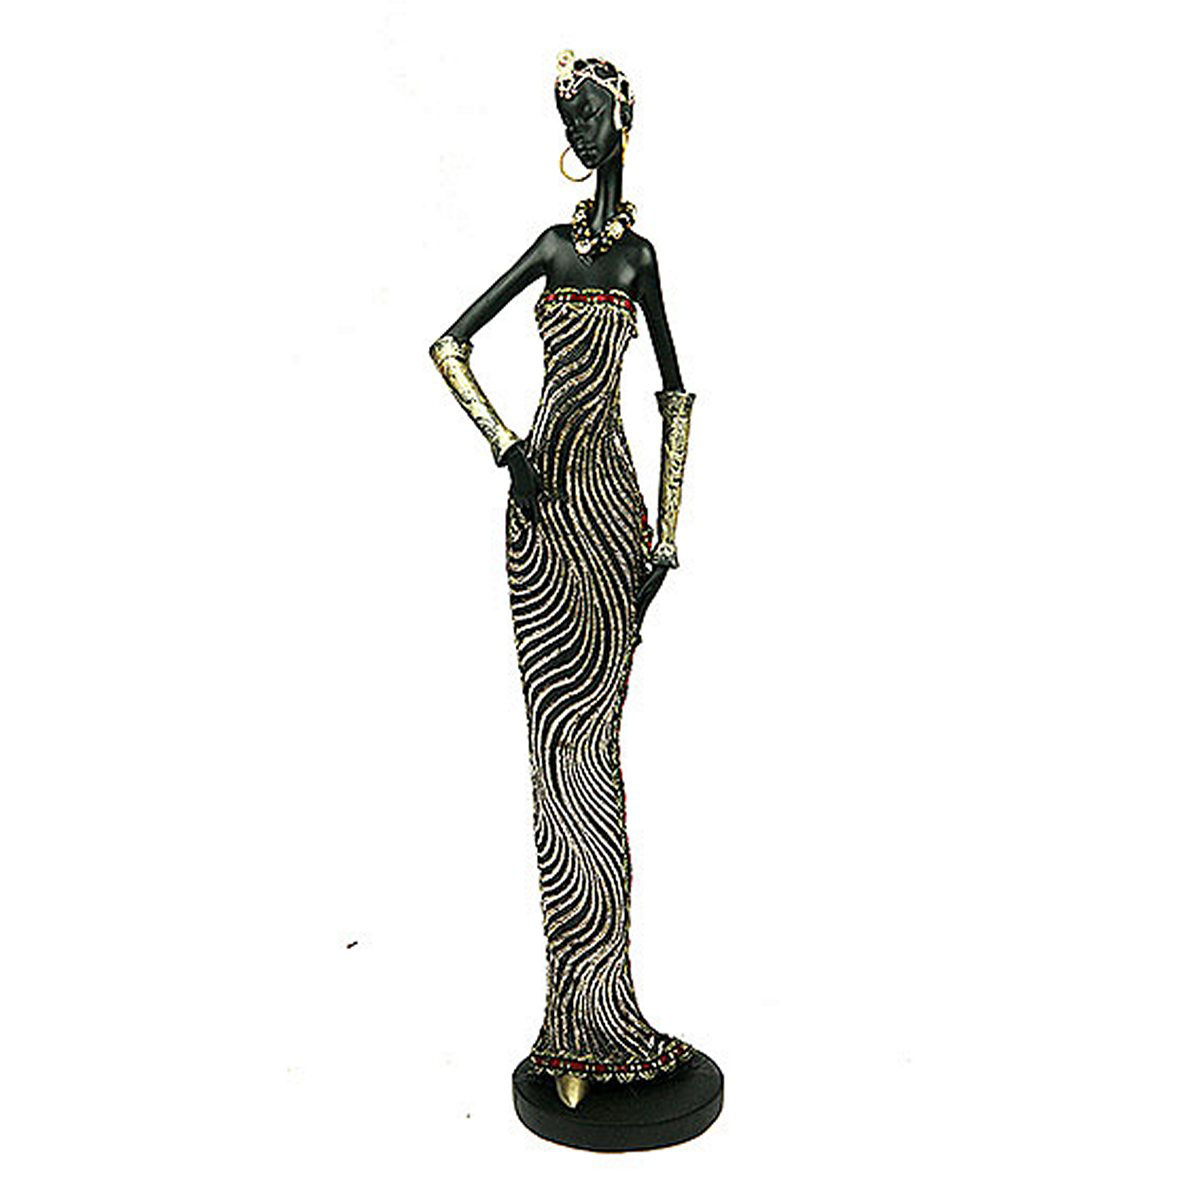 Статуэтка Русские Подарки Африканка, 7 х 8 х 32 см статуэтка русские подарки африканка 11 х 15 х 24 см